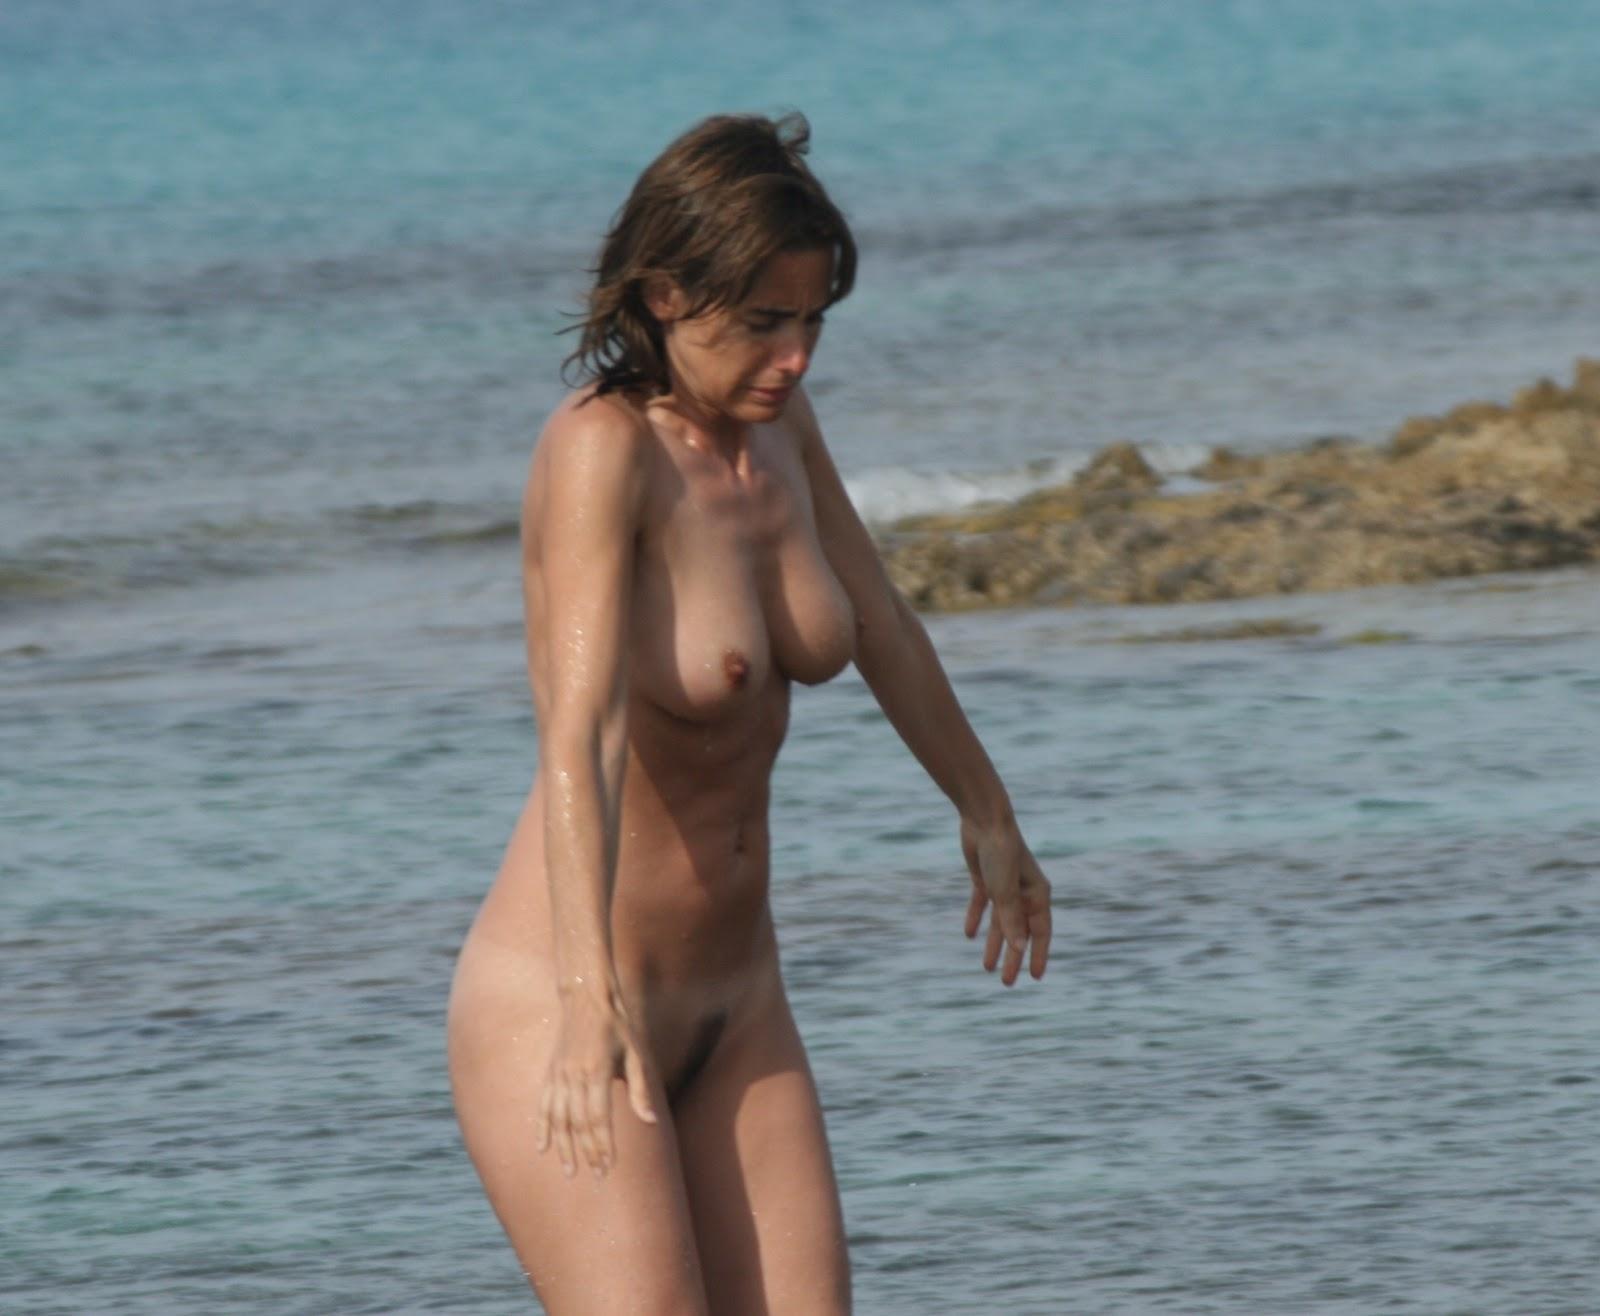 3Apa Porn stunning indian beauty nude fck sex porn images worlds